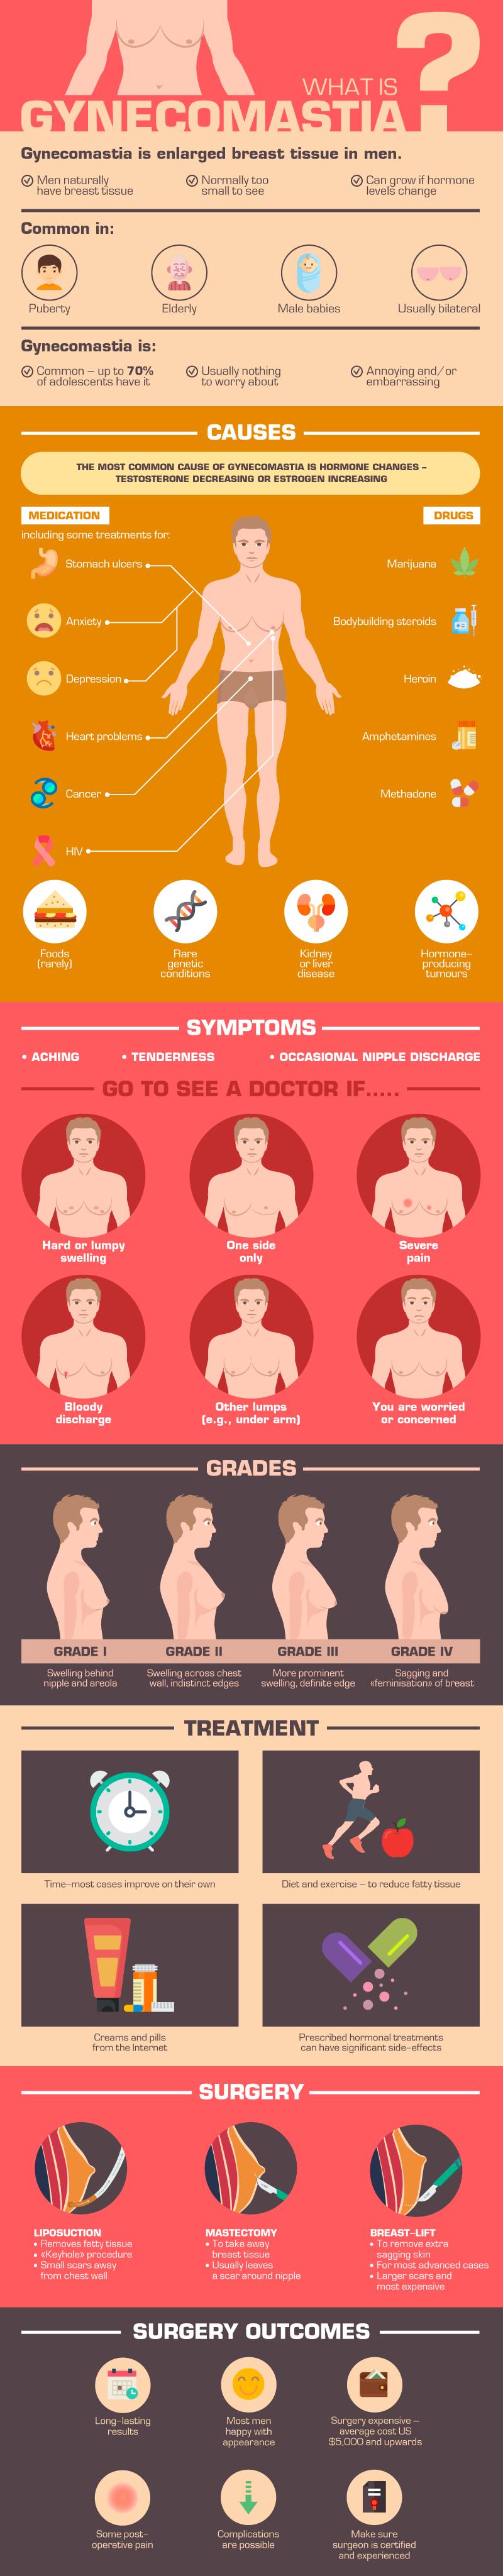 gynecomastia-infographic-plaza